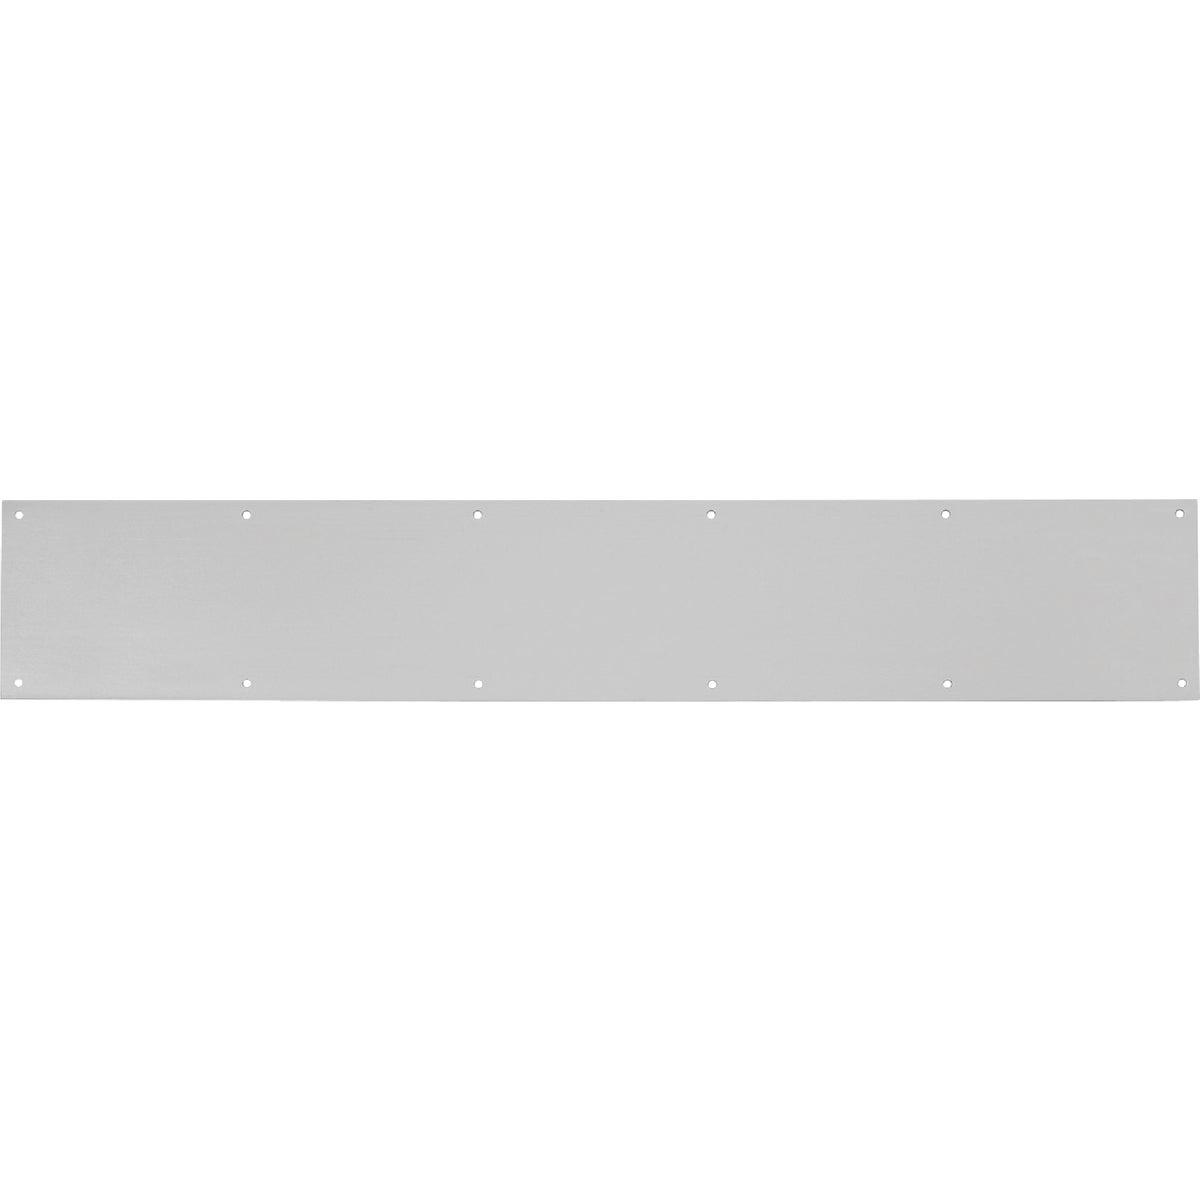 6 X 30 32D CS KICK PLATE - DT100055 by Tell Mfg Inc